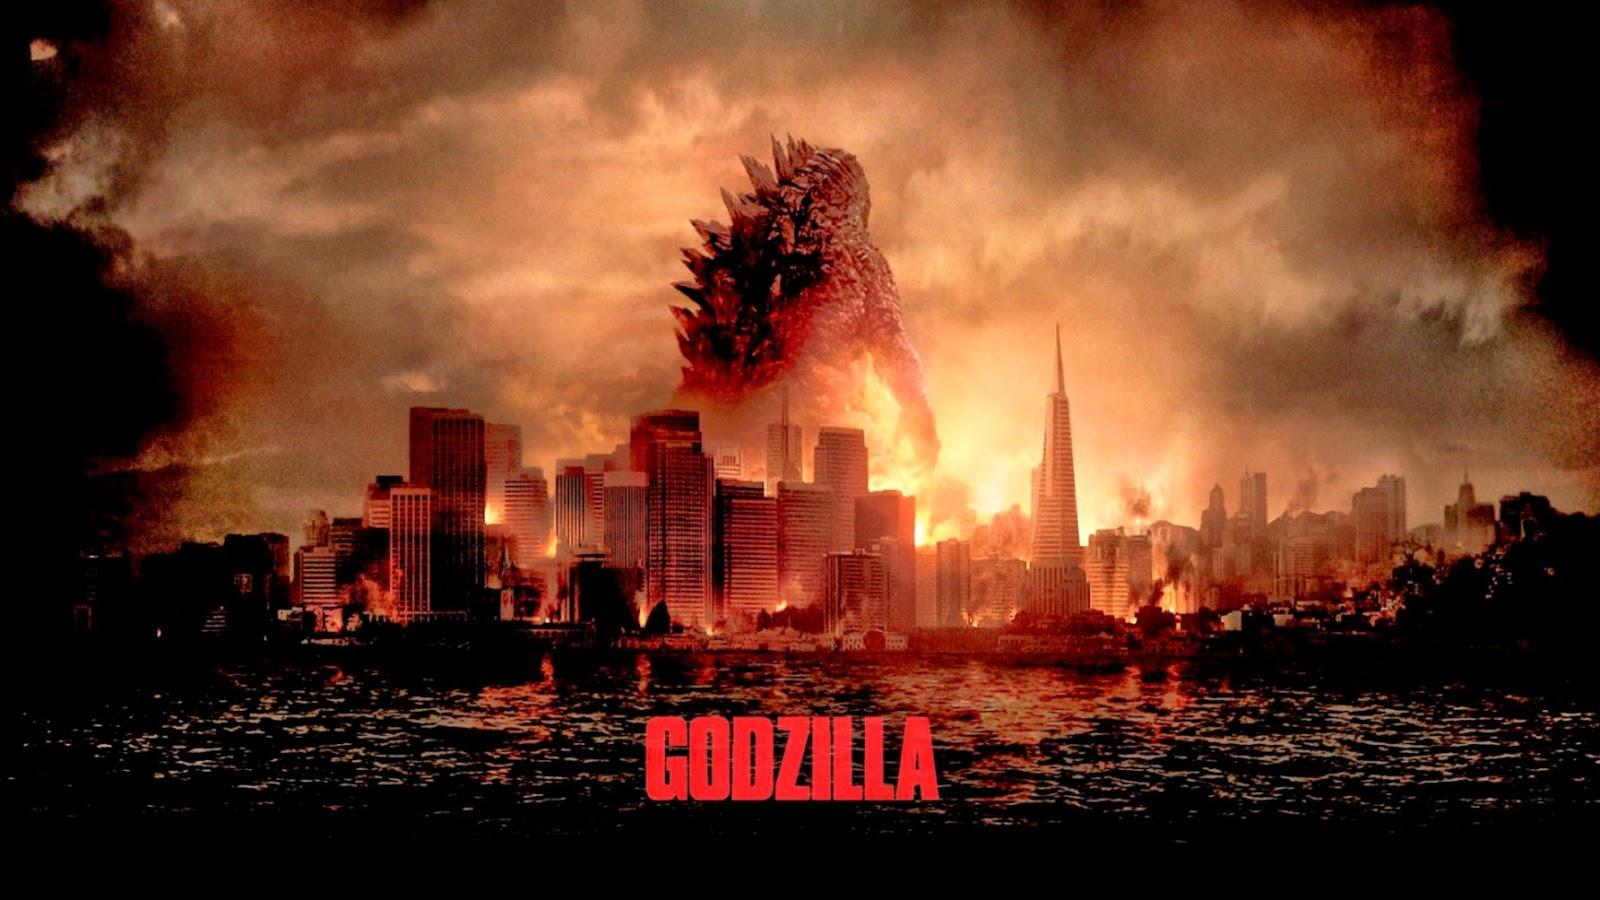 New Godzilla Movie 2014